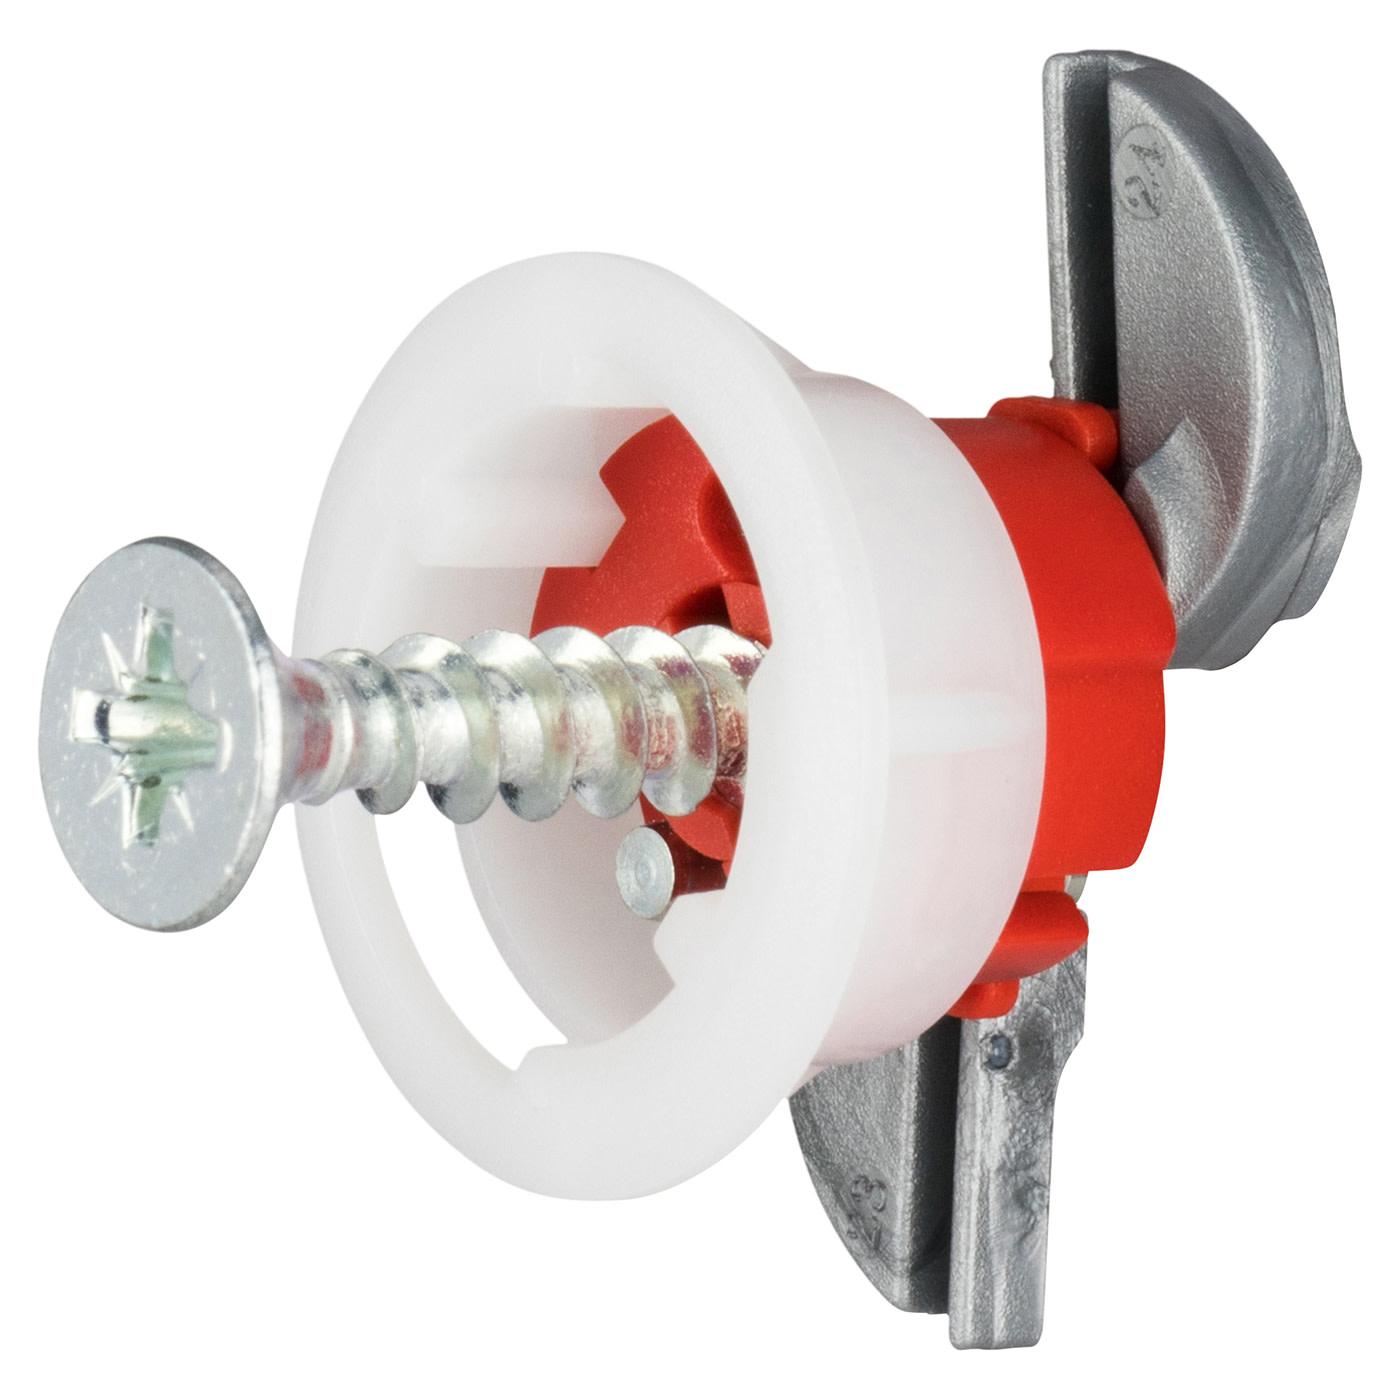 Grip It® Fixing - 18mm Hole - 5.0 x 30mm Screw - Pack 4)